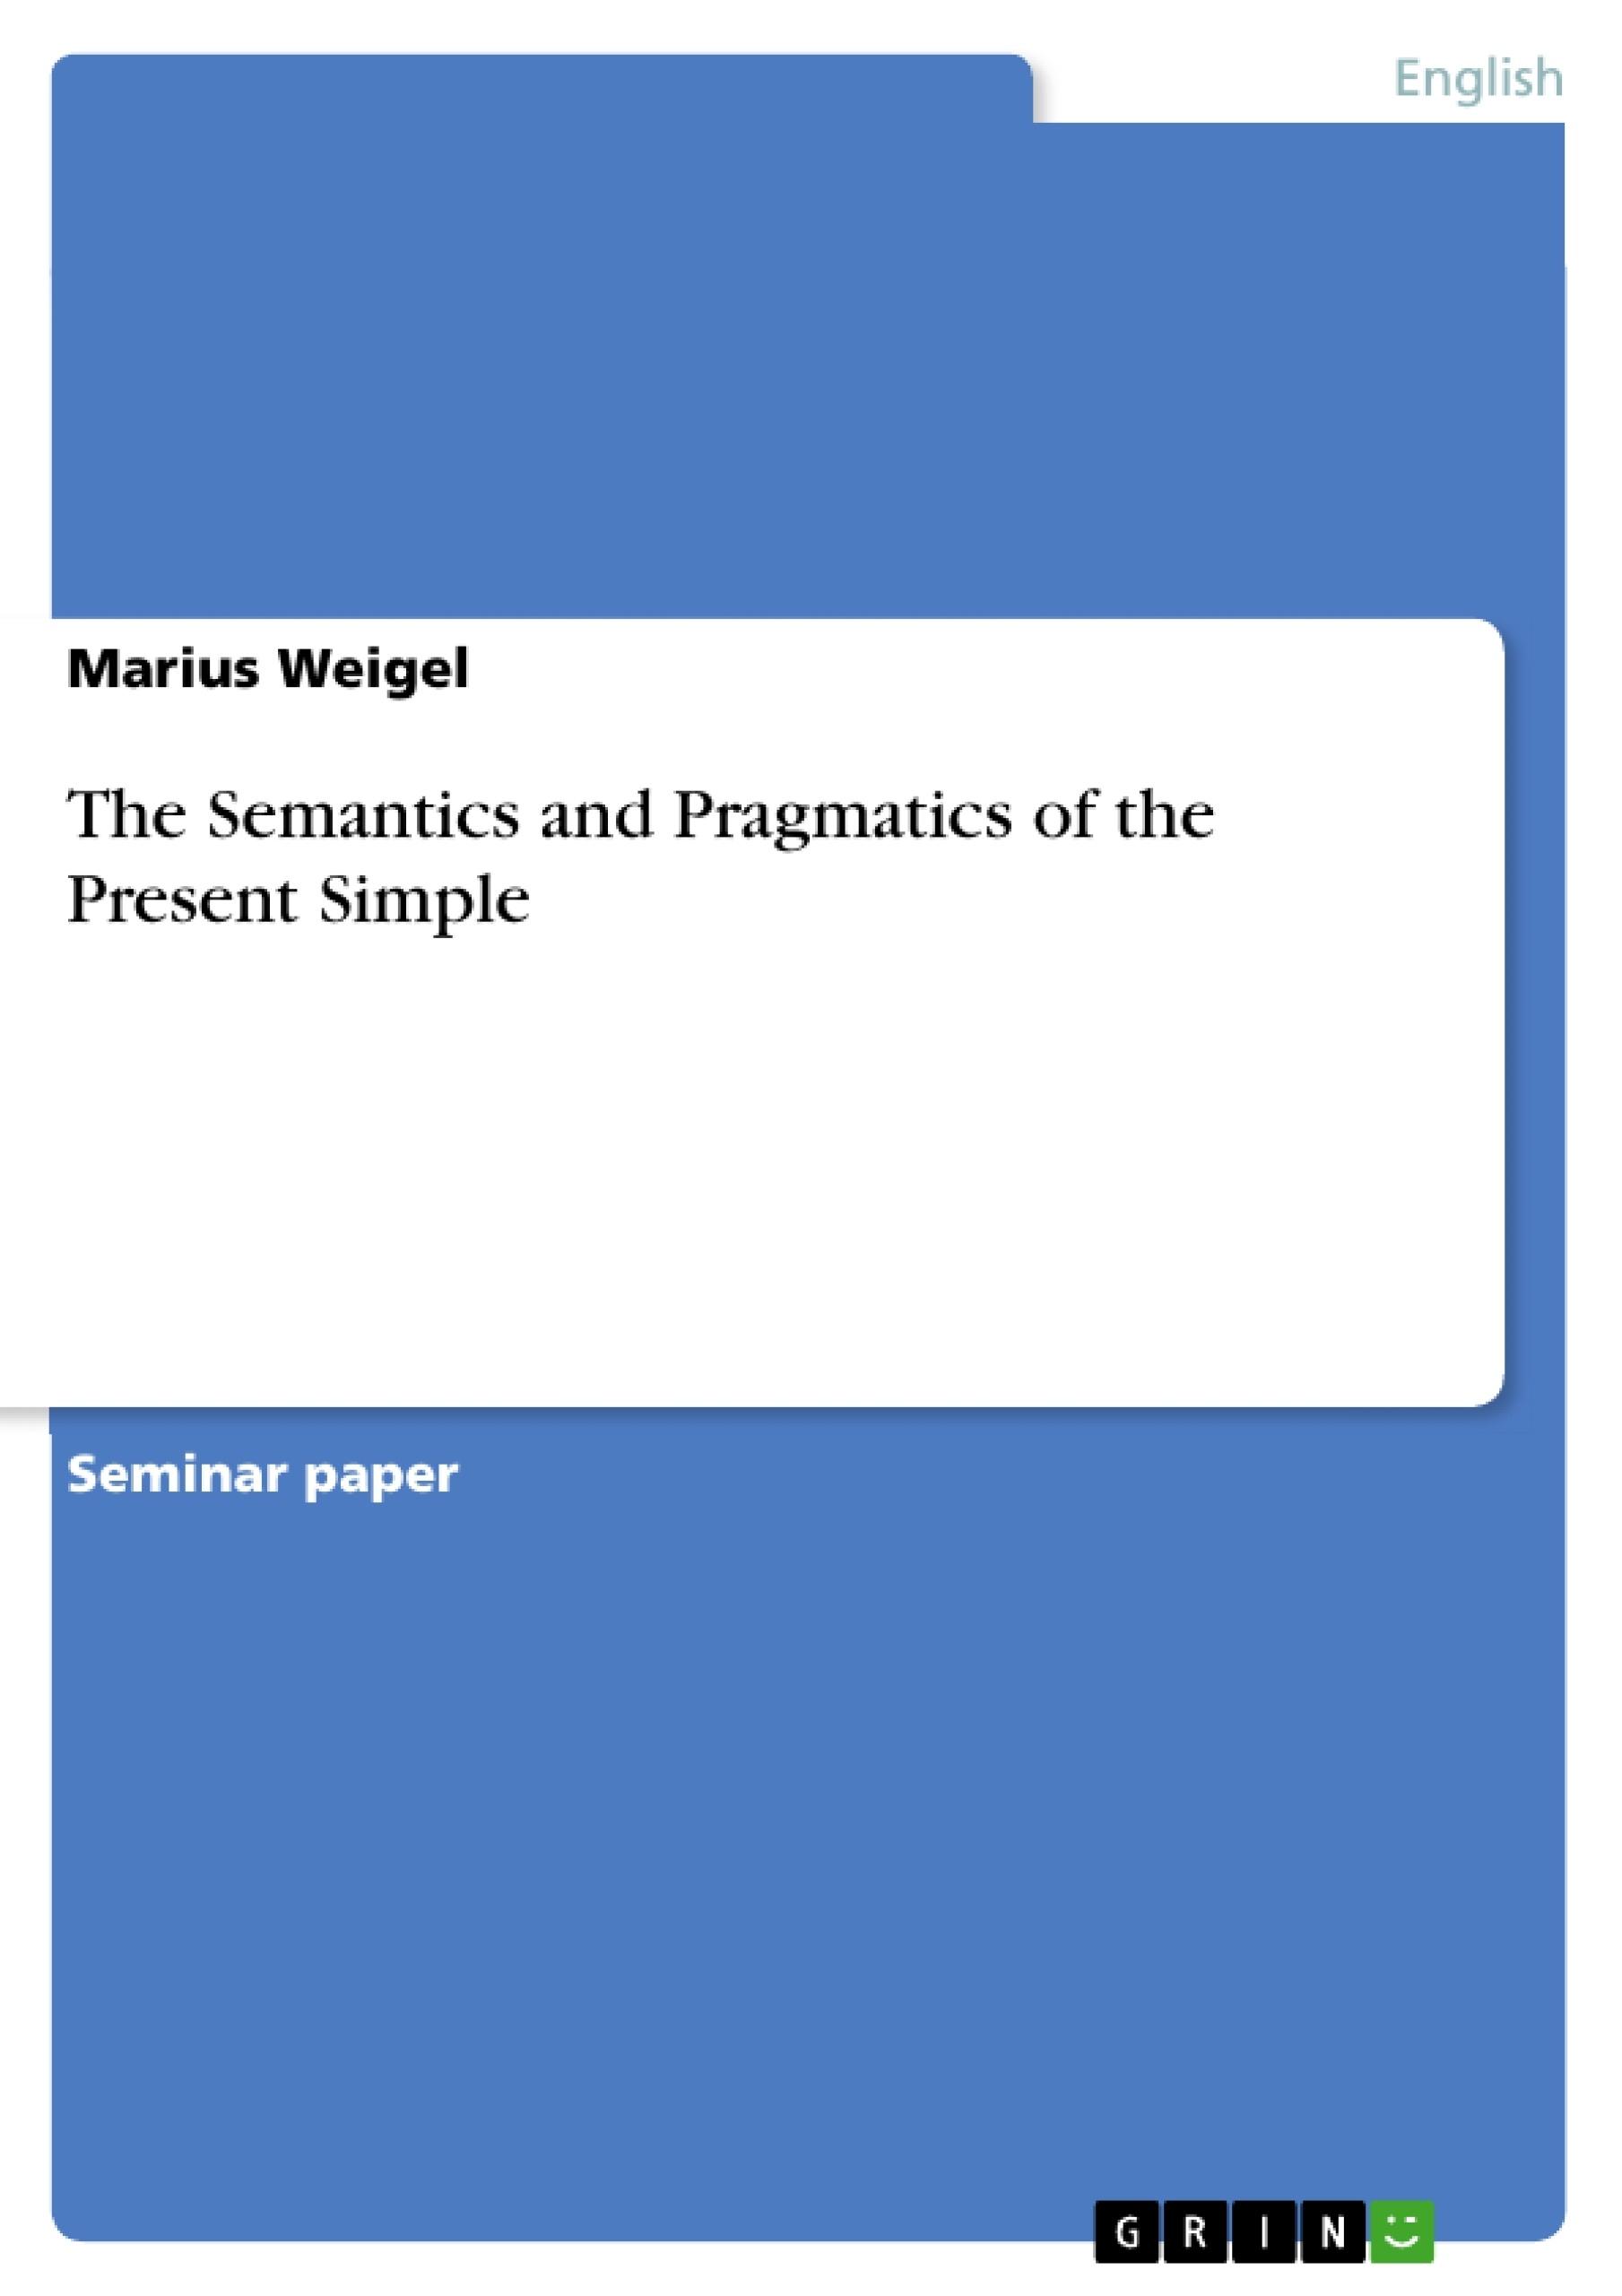 Title: The Semantics and Pragmatics of the Present Simple